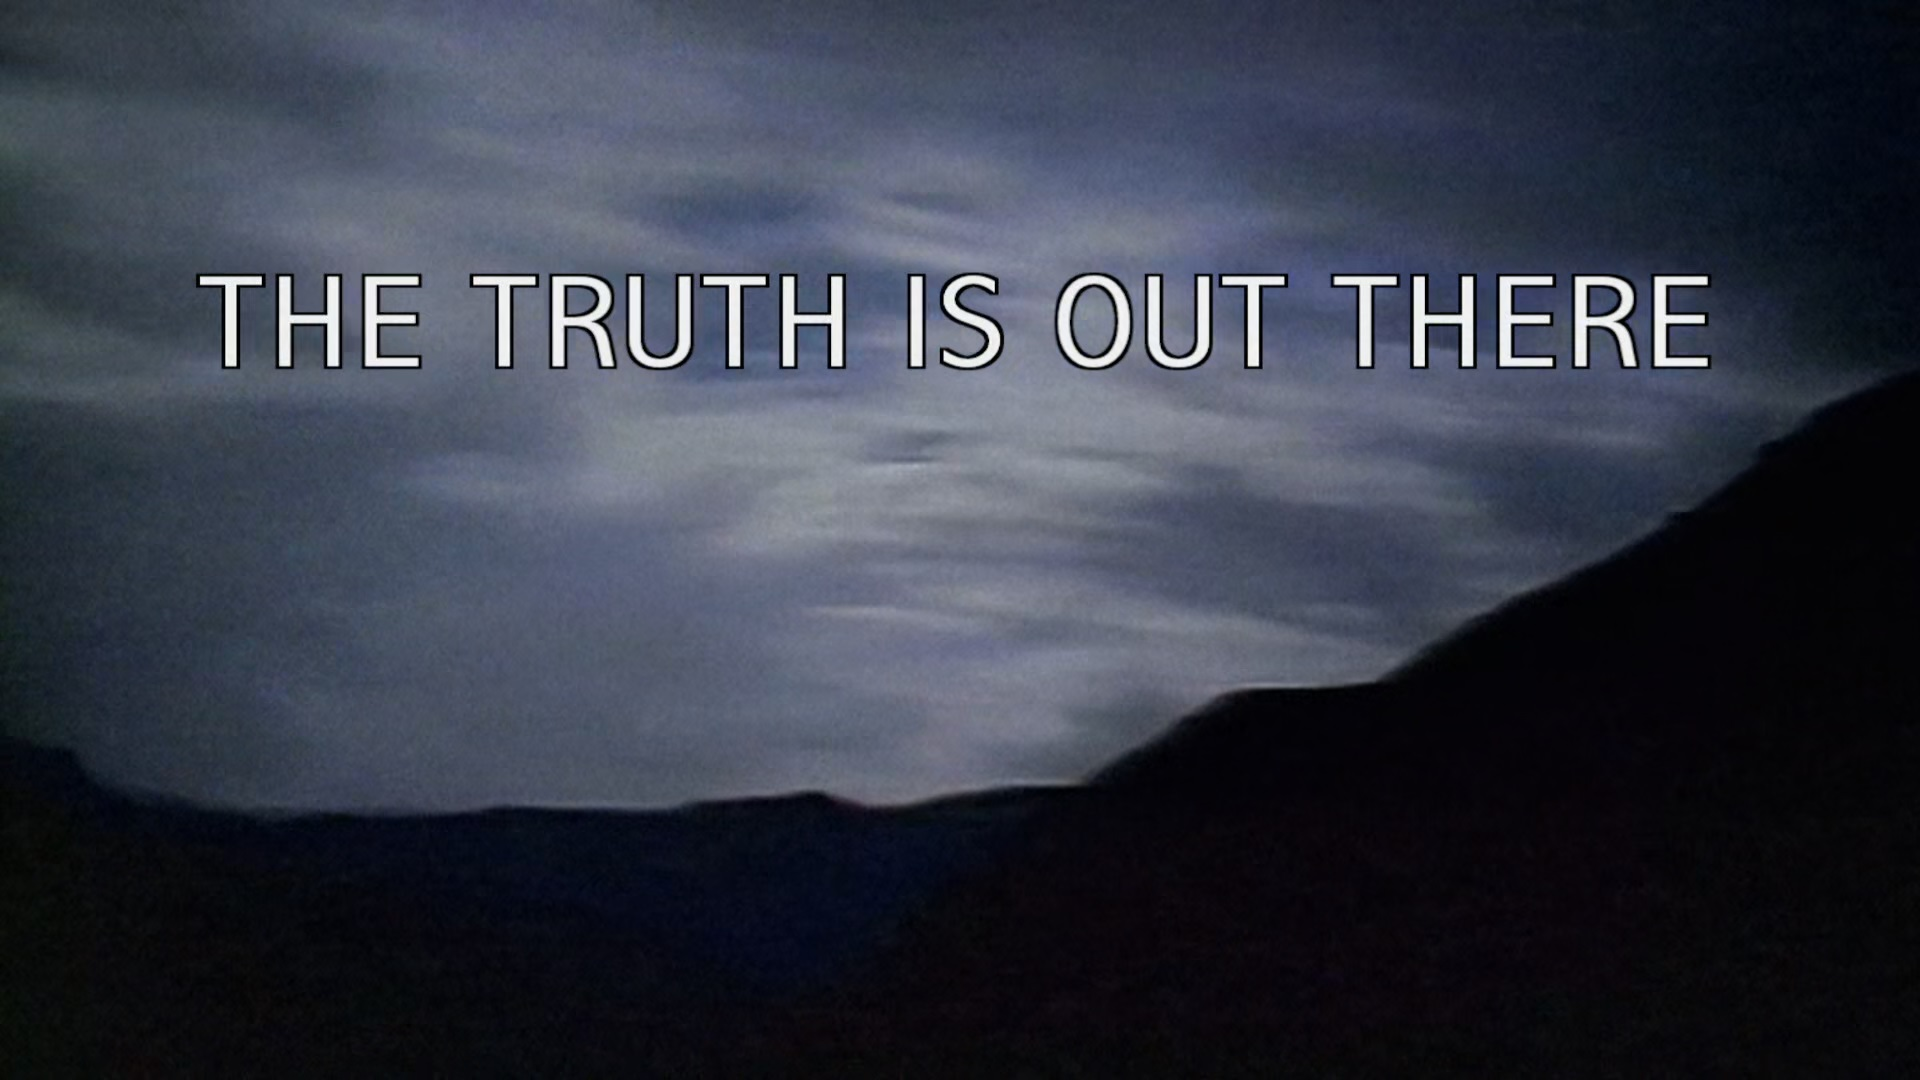 The X Files Oversized Logo Mens T Shirt Lightning Stormy Skies Mulder Scully FBI